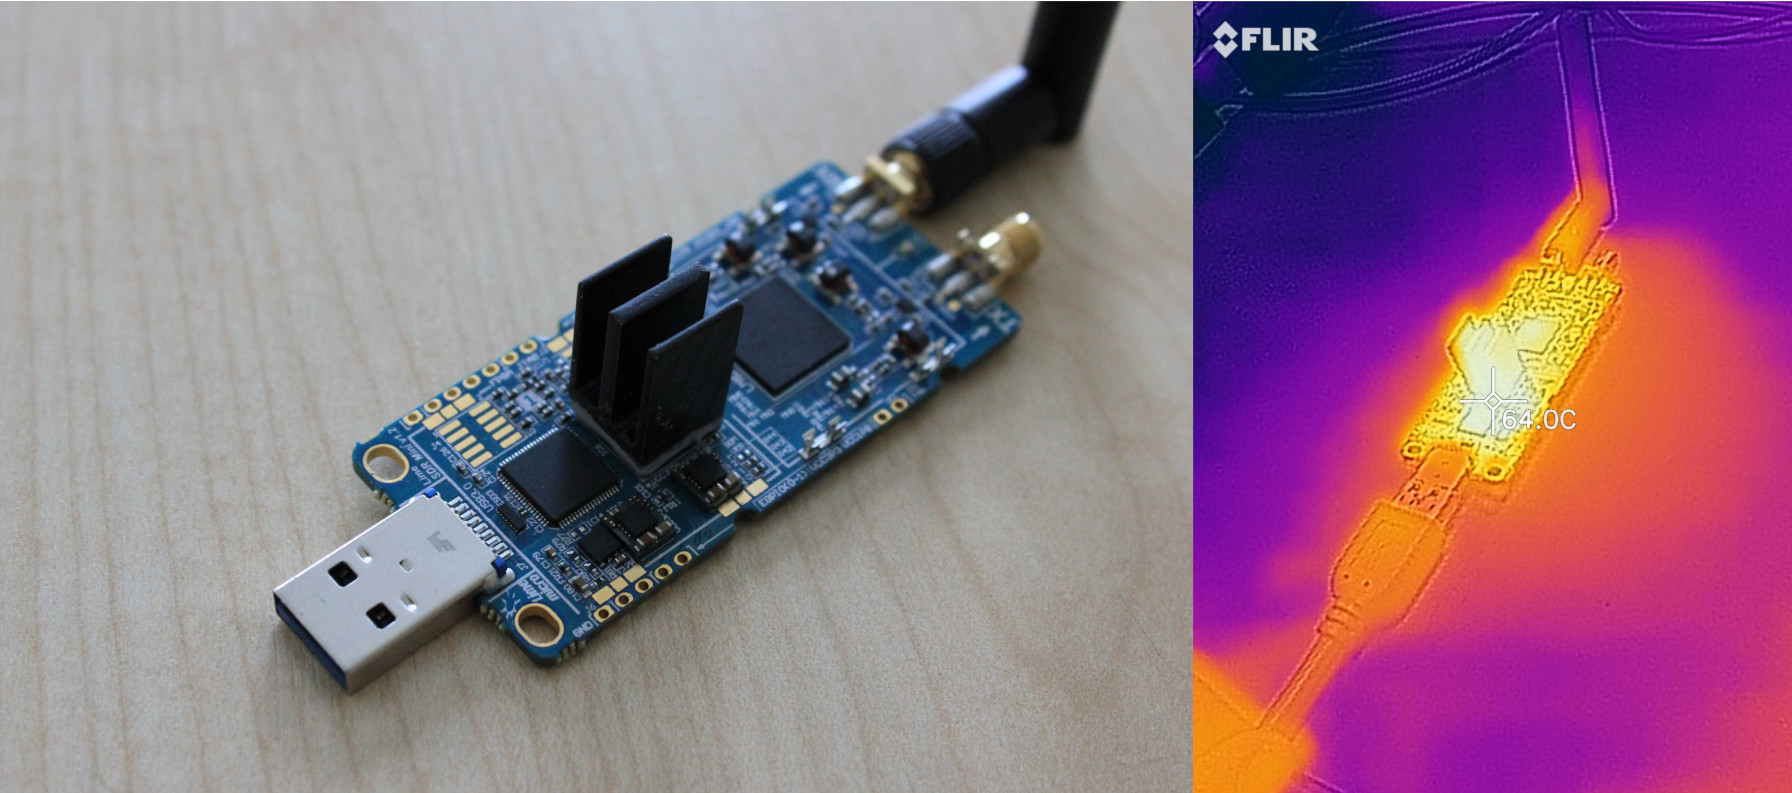 FPGA sinked